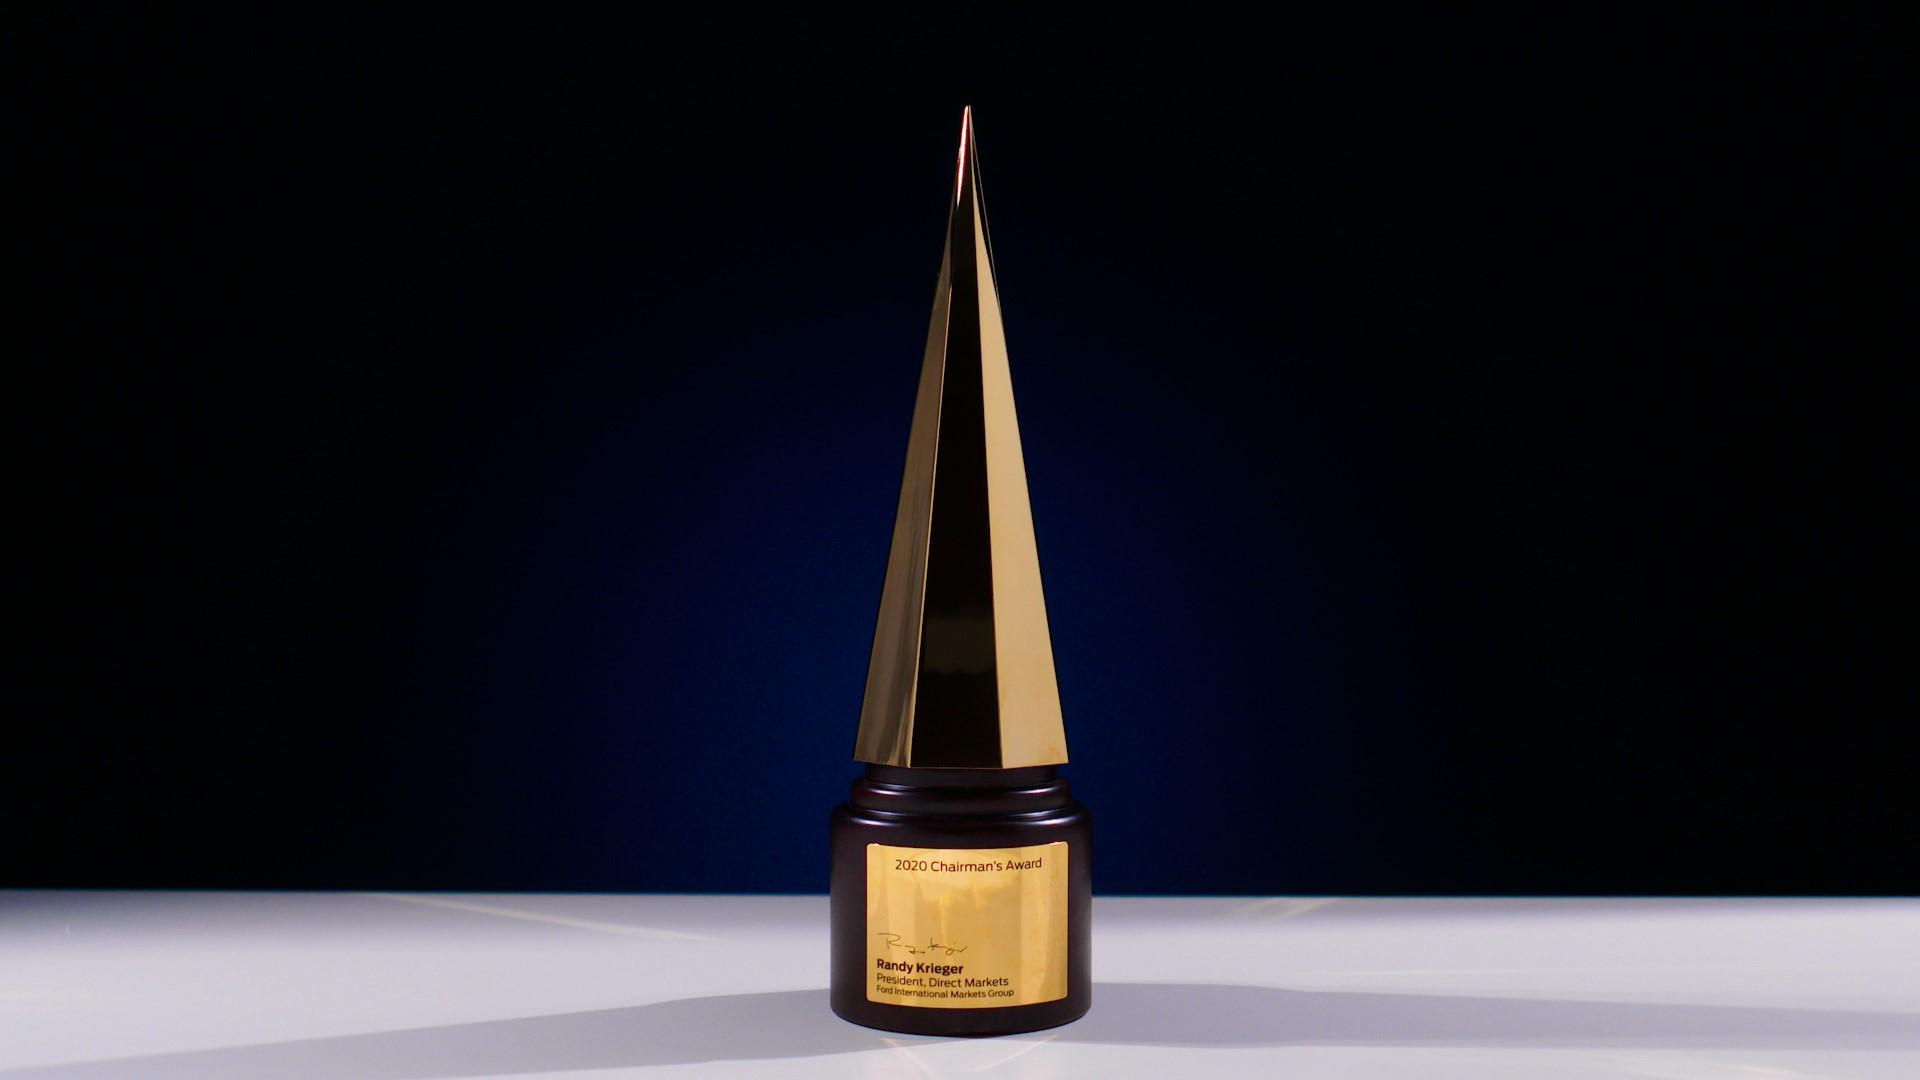 Ford Chairman Award